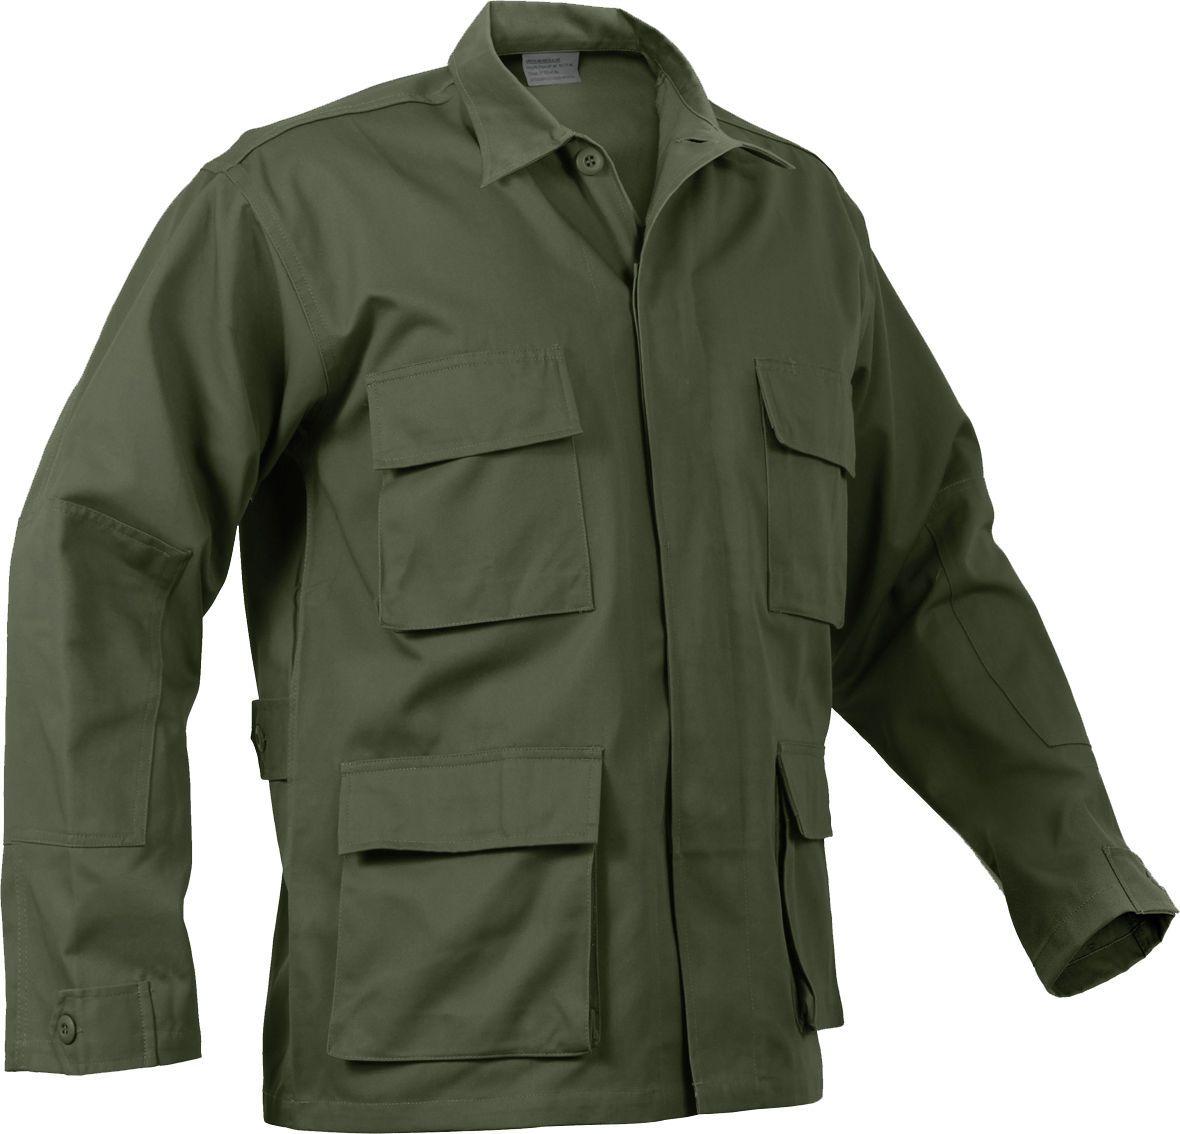 Mens Olive Drab Long Sleeve Military Bdu Shirt Coat Uniform Army Fatigues  Army Navy Store d3260e472e7